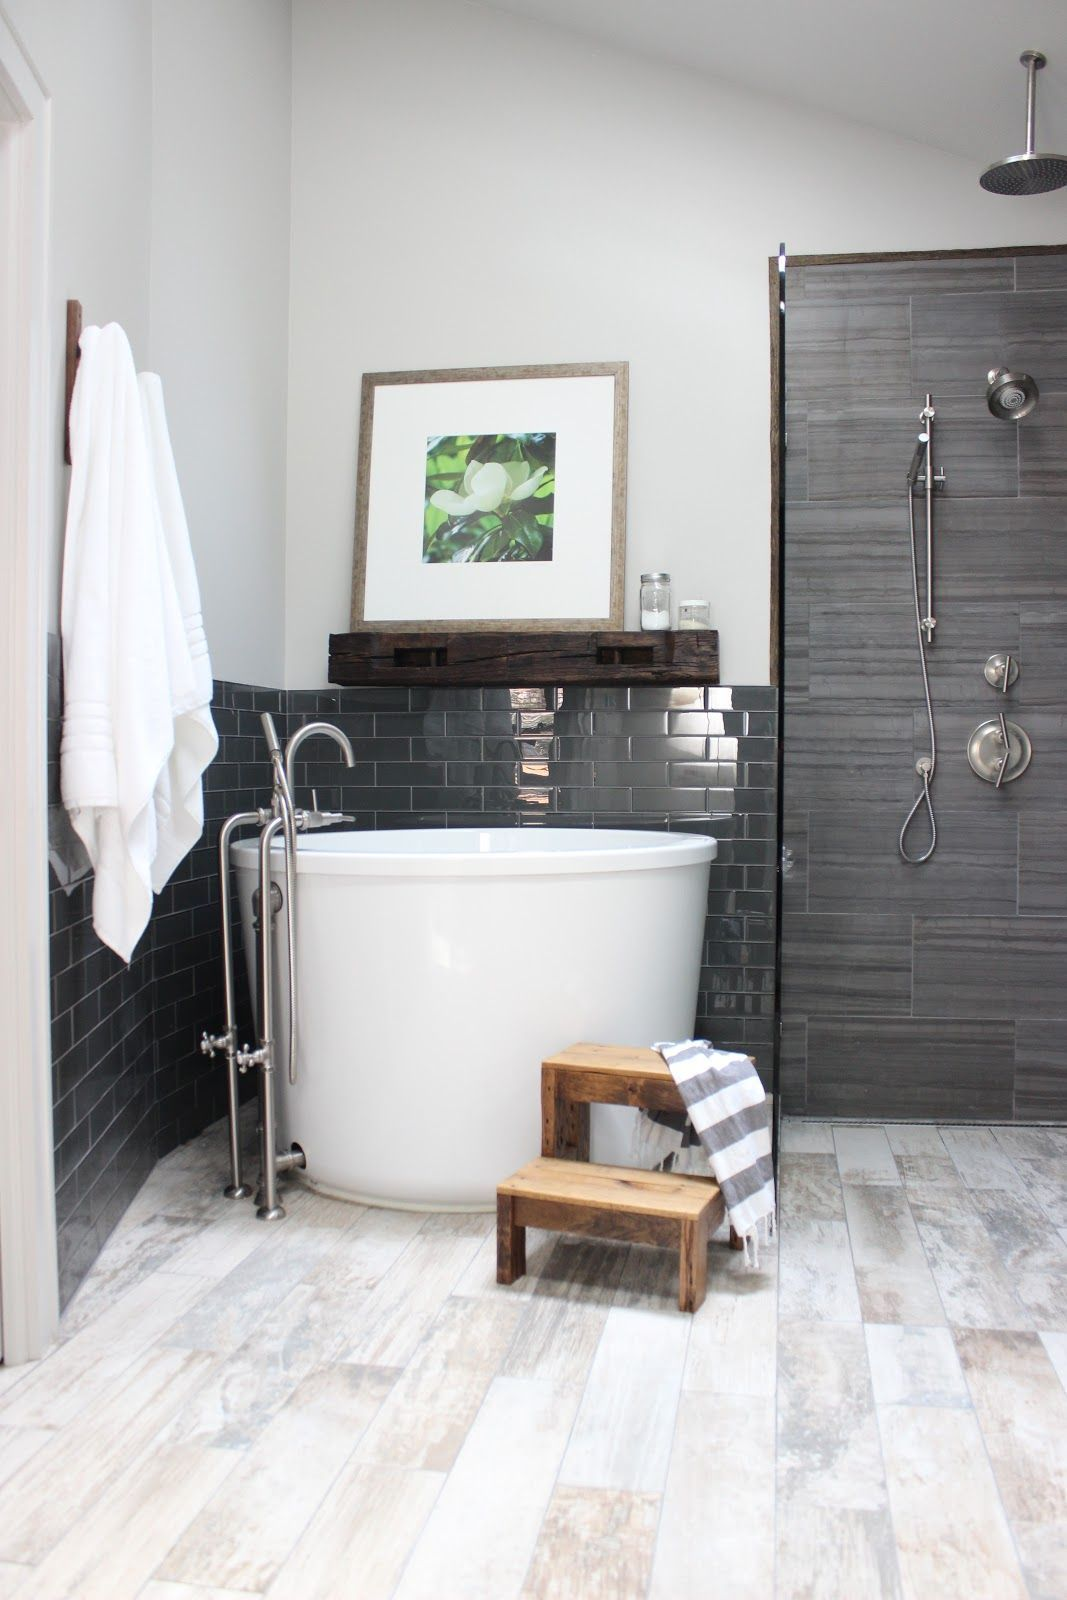 23 Awesome Japanese Bathtub   Bathroom Ideas   Pinterest   Tubs ...